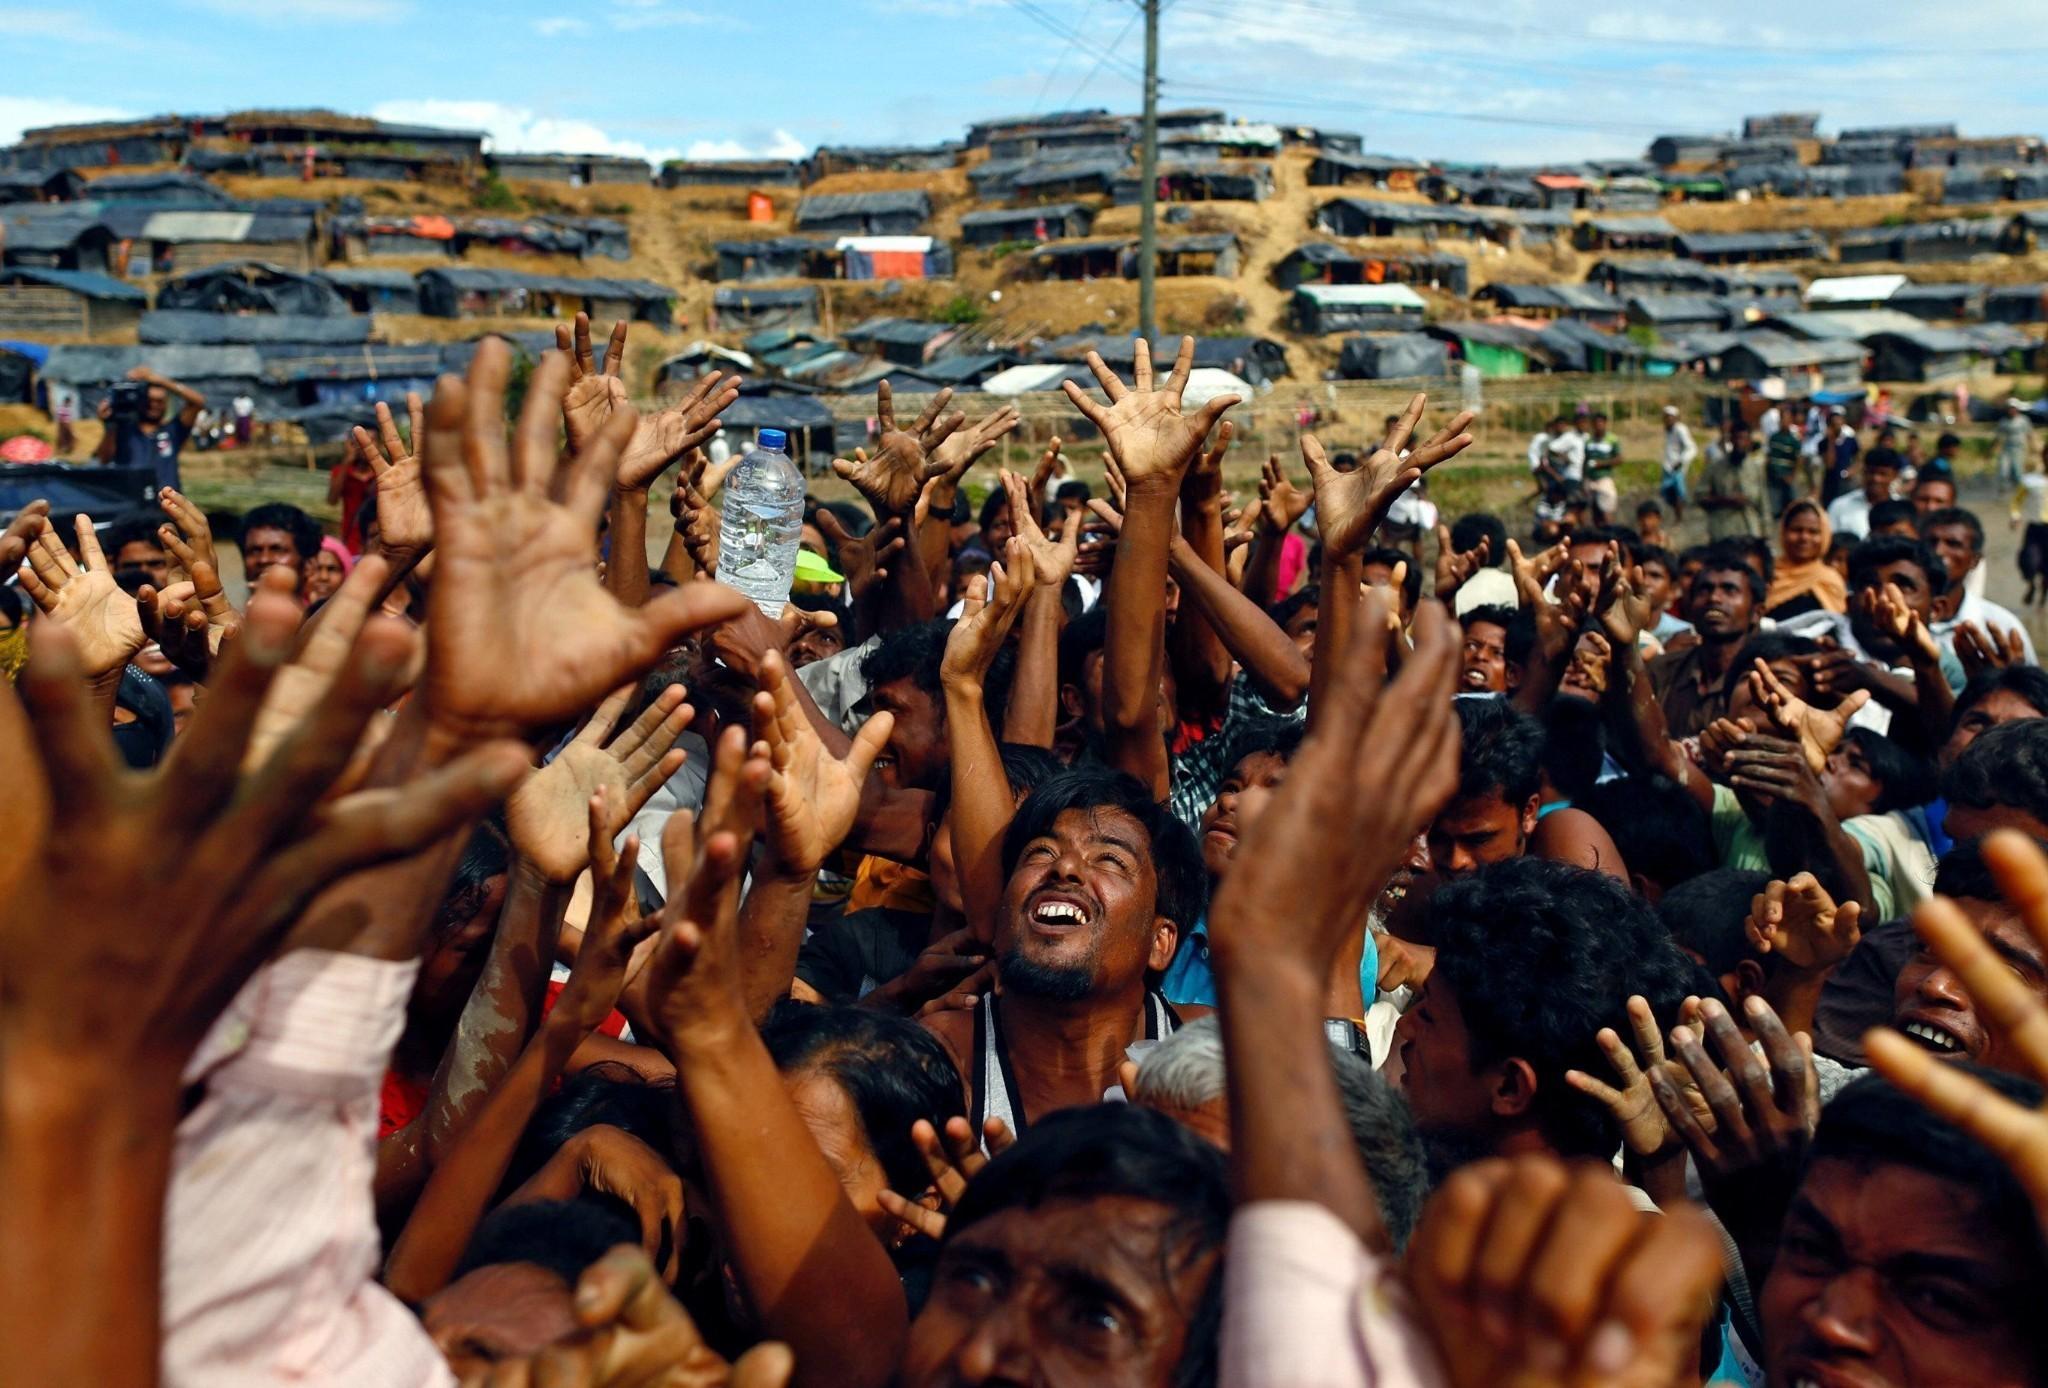 'Humanitarian catastrophe' unfolding as Myanmar takes over aid efforts in Rakhine state